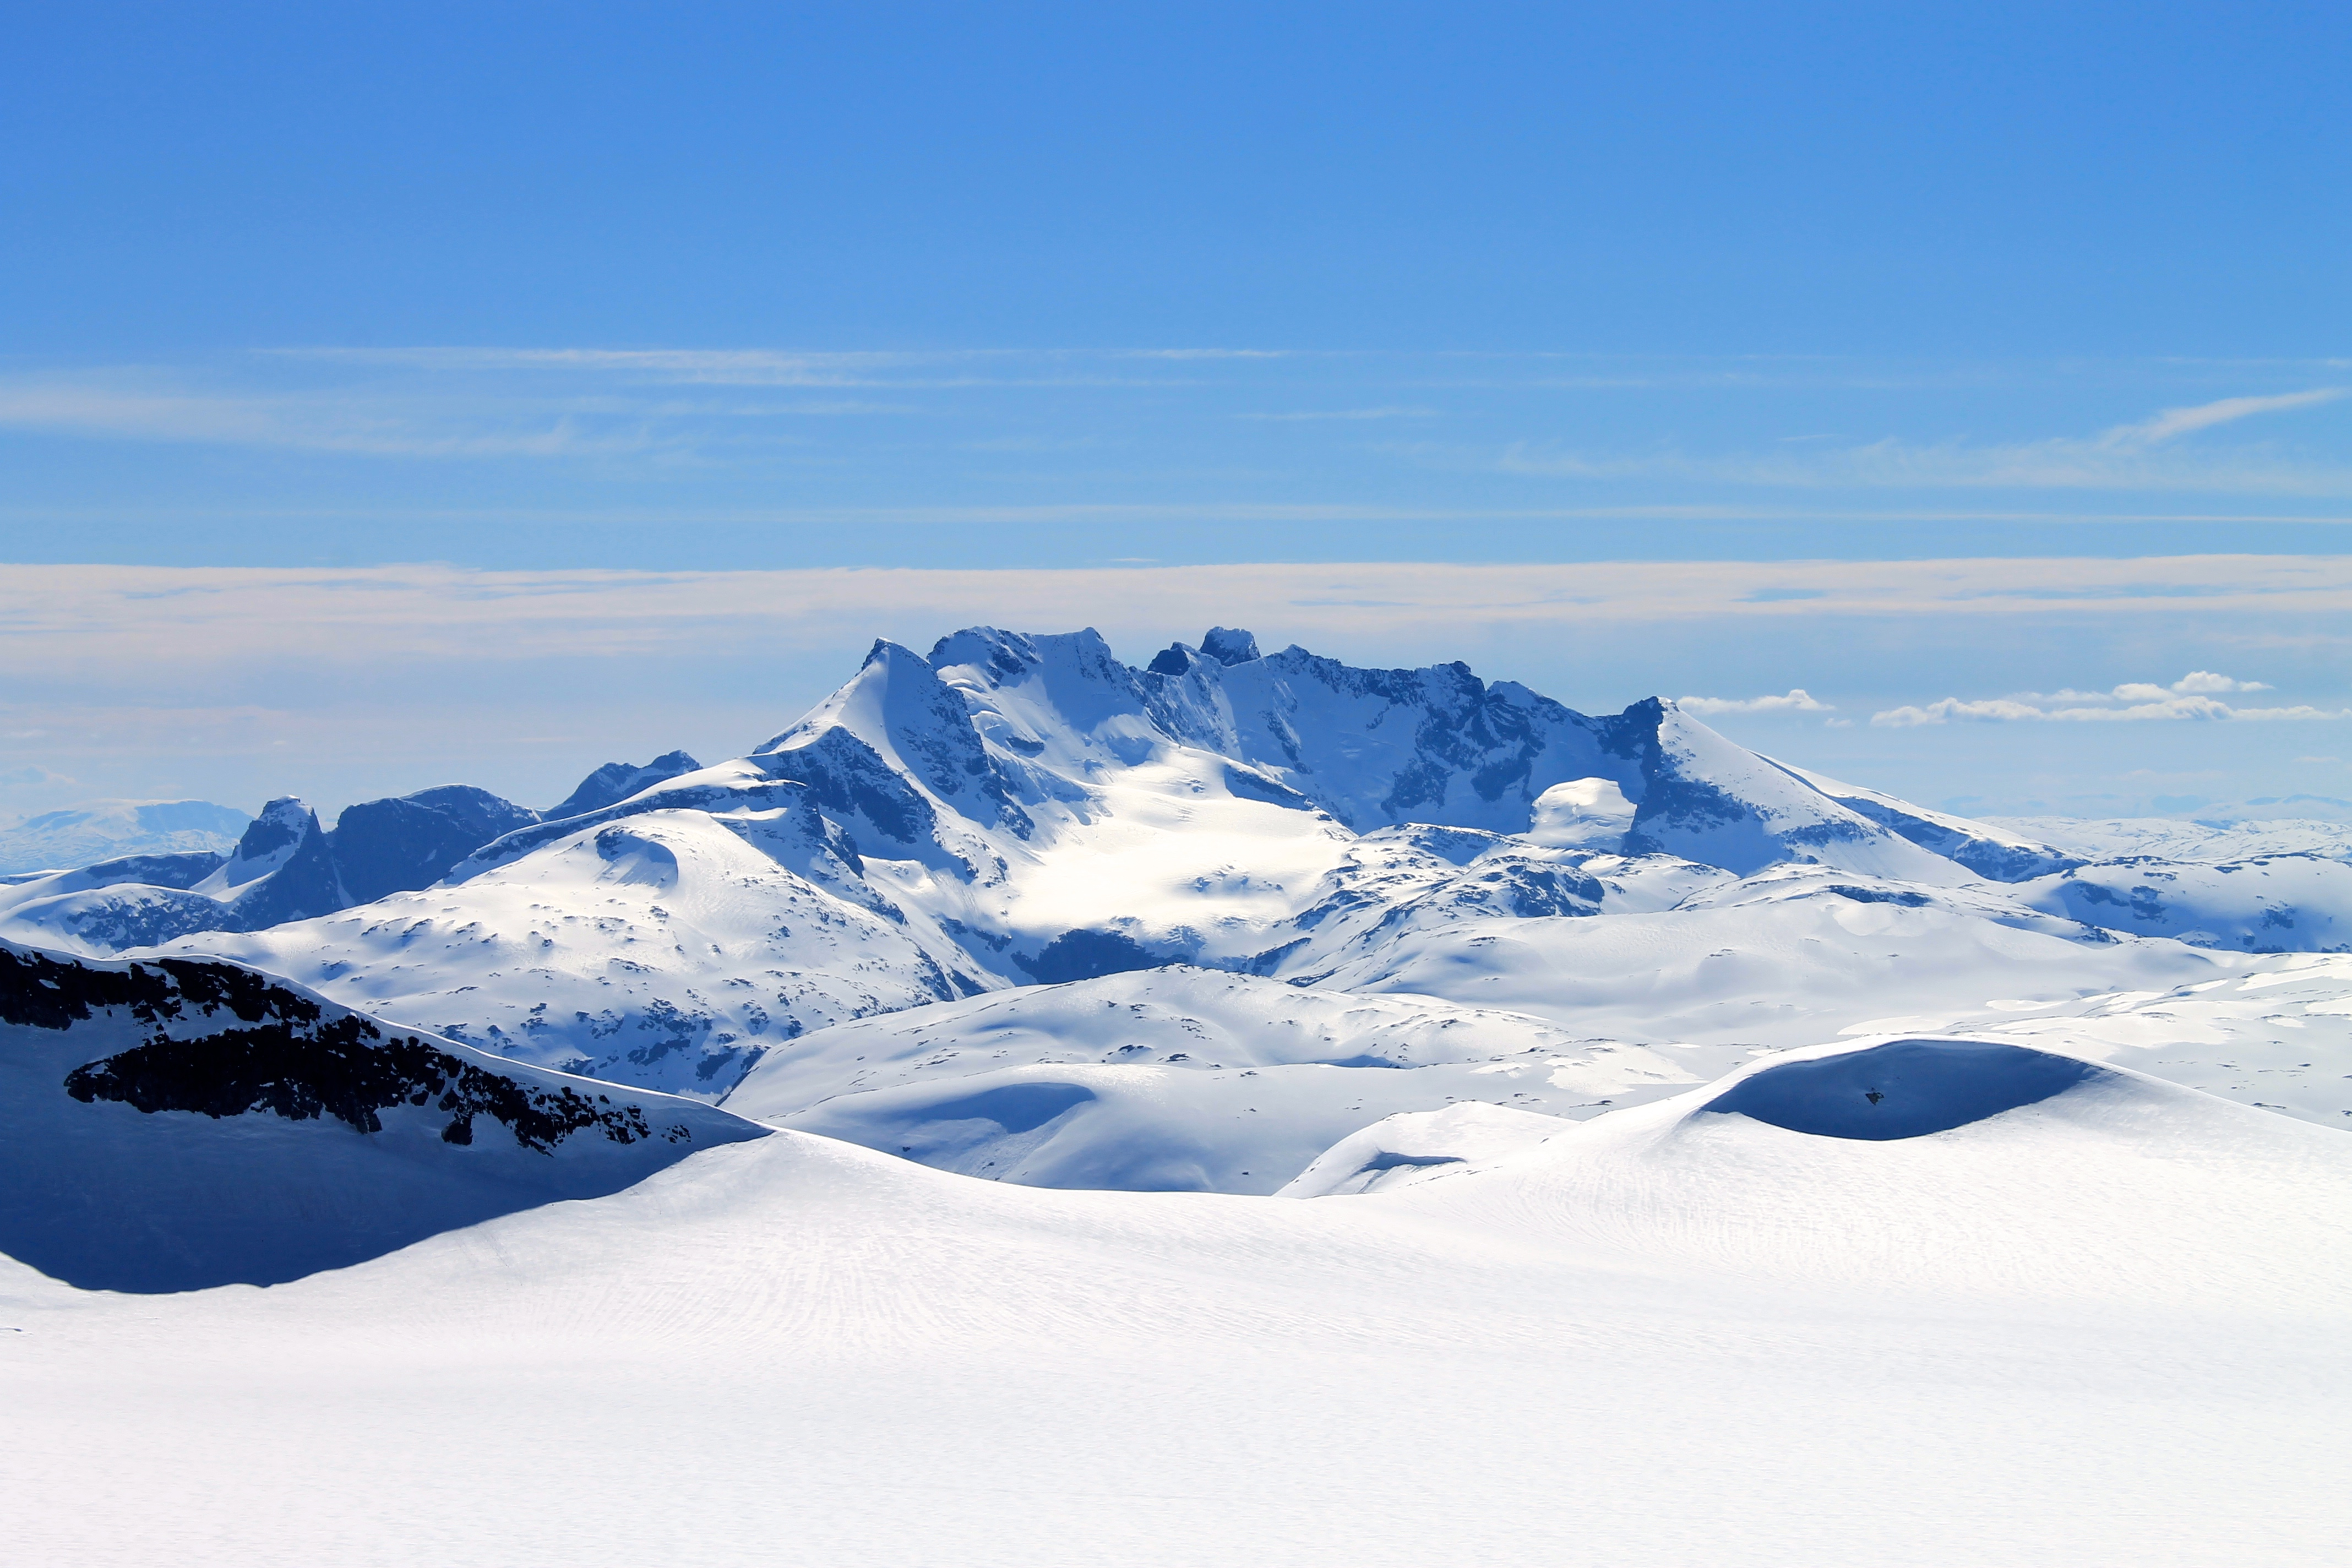 Hurrungane er det villeste fjellområdet i Norge.